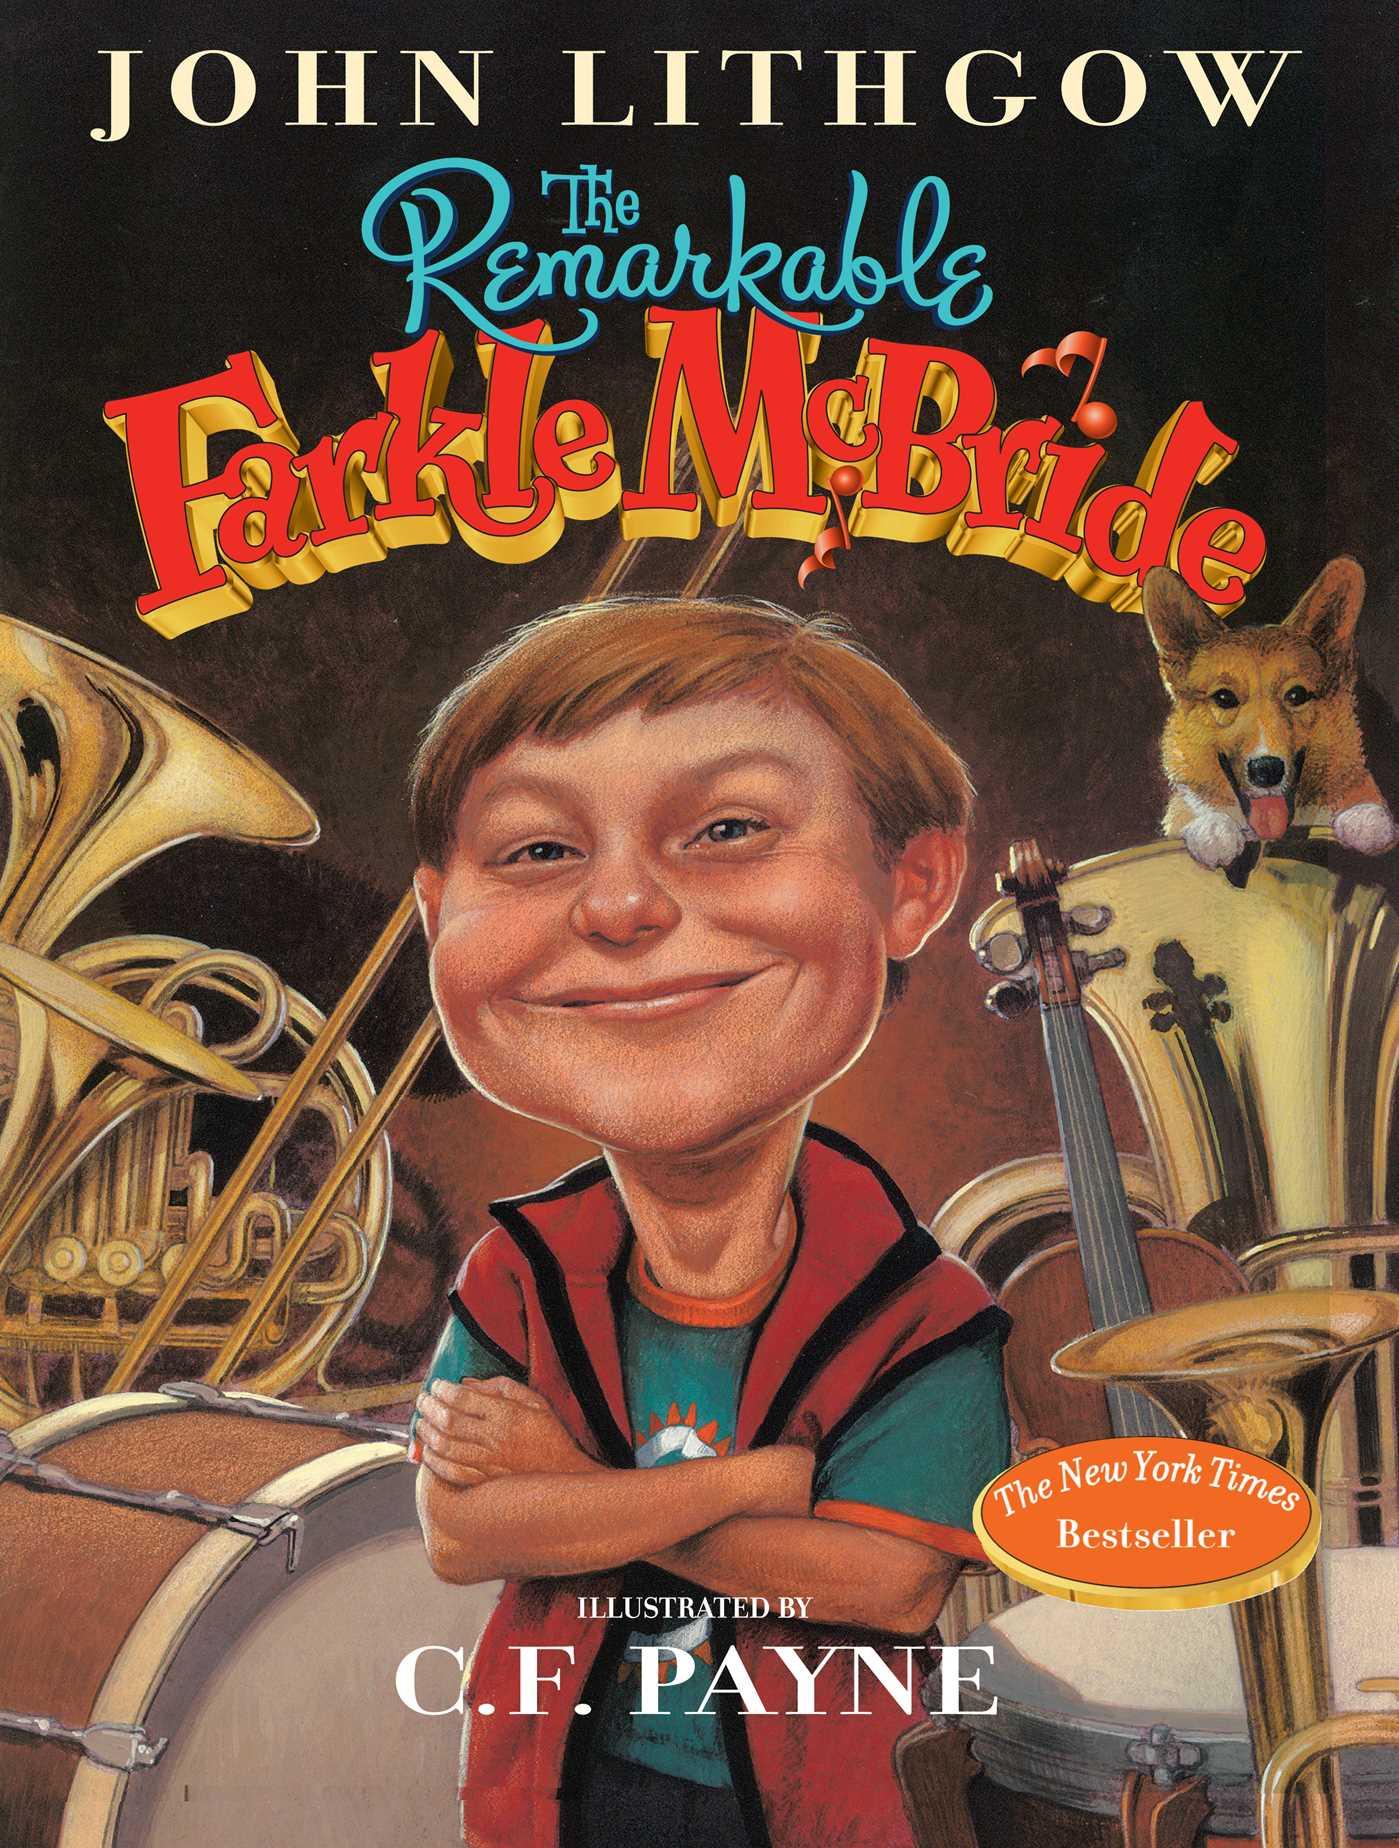 The remarkable farkle mcbride 9781442442450 hr